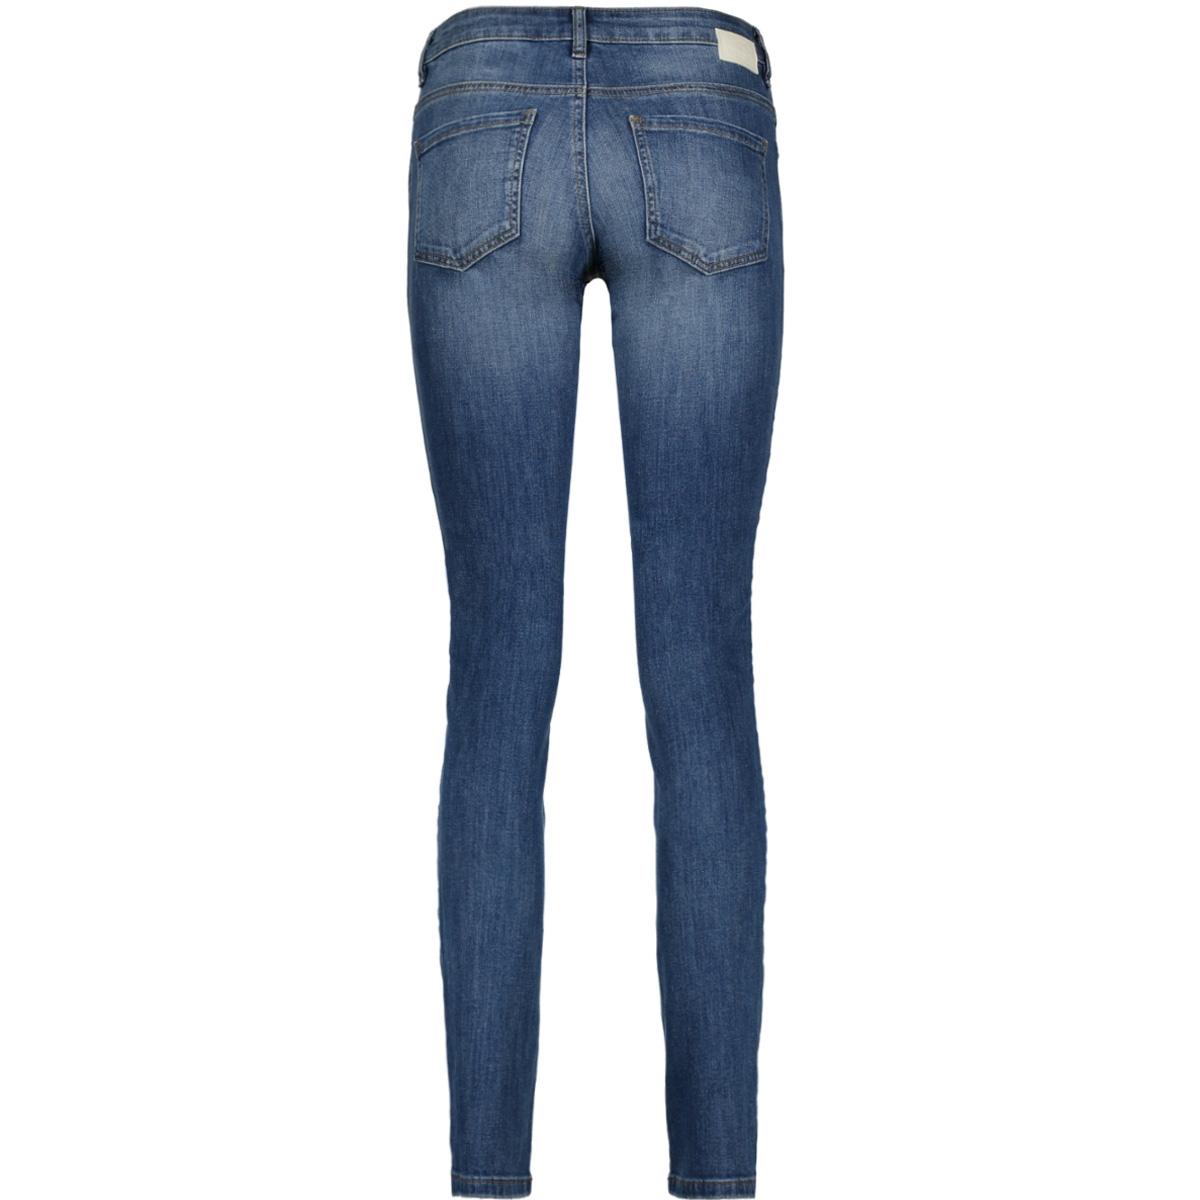 6206115.00.70 tom tailor jeans 1052